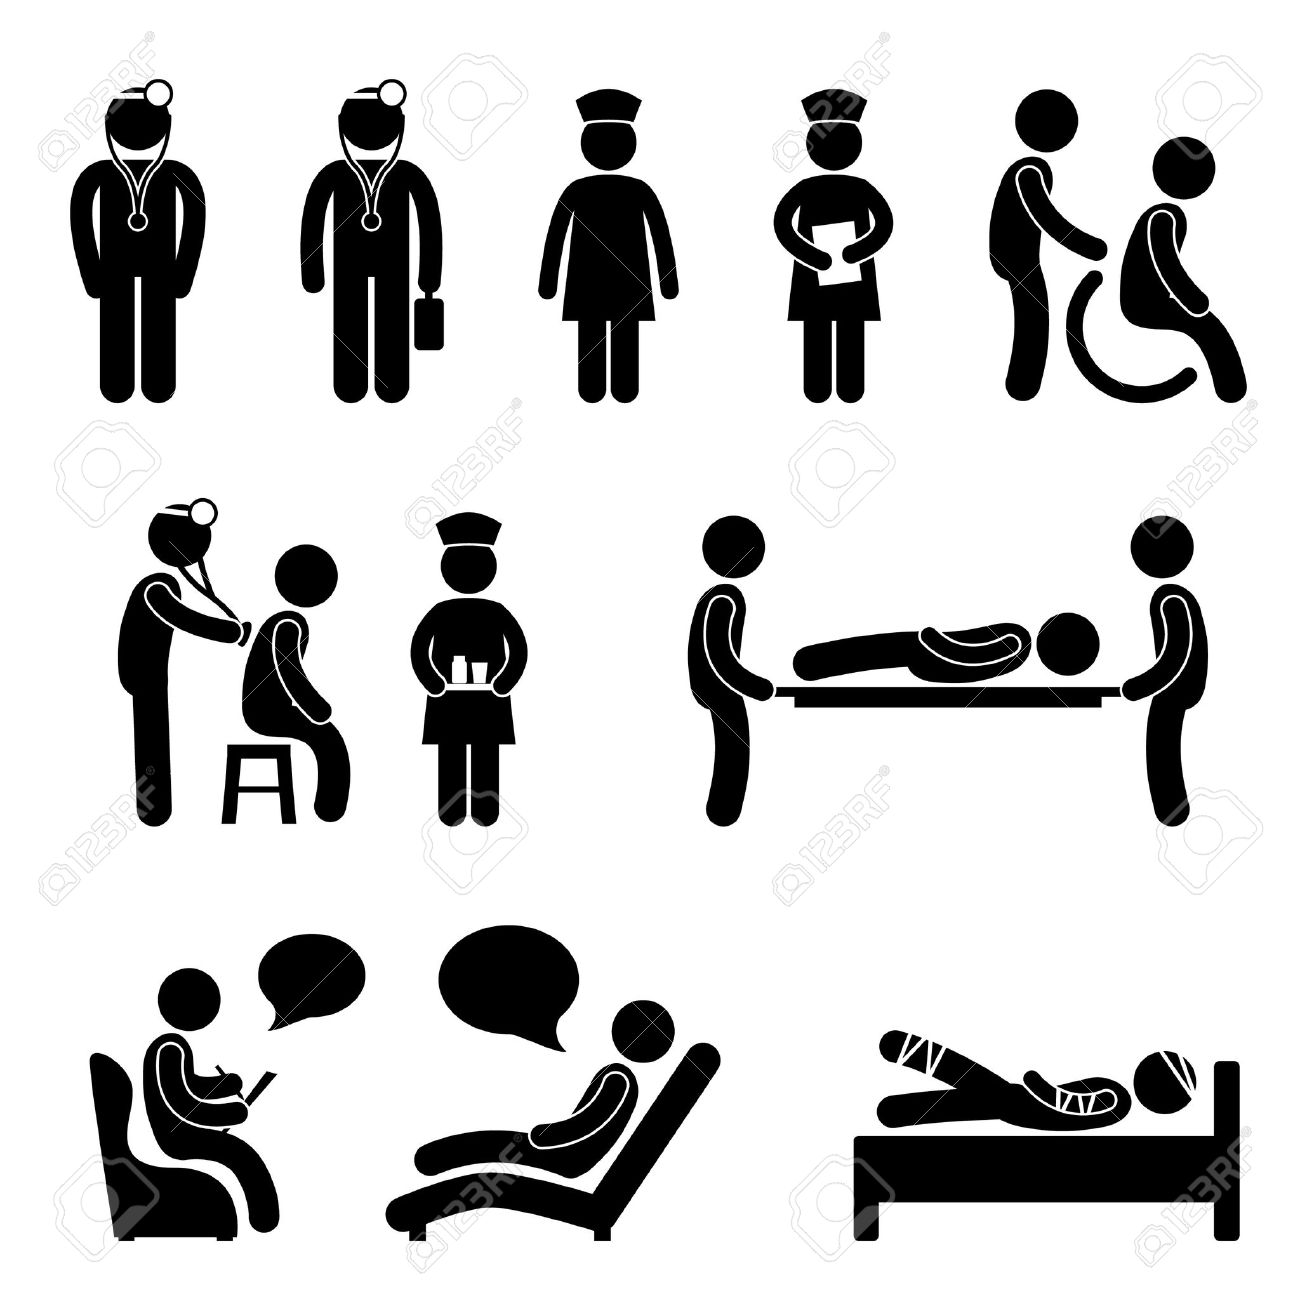 Doctor Nurse Hospital Medical Psychiatrist Patient Sick Icon Sign Symbol Pictogram Stock Vector - 18797475